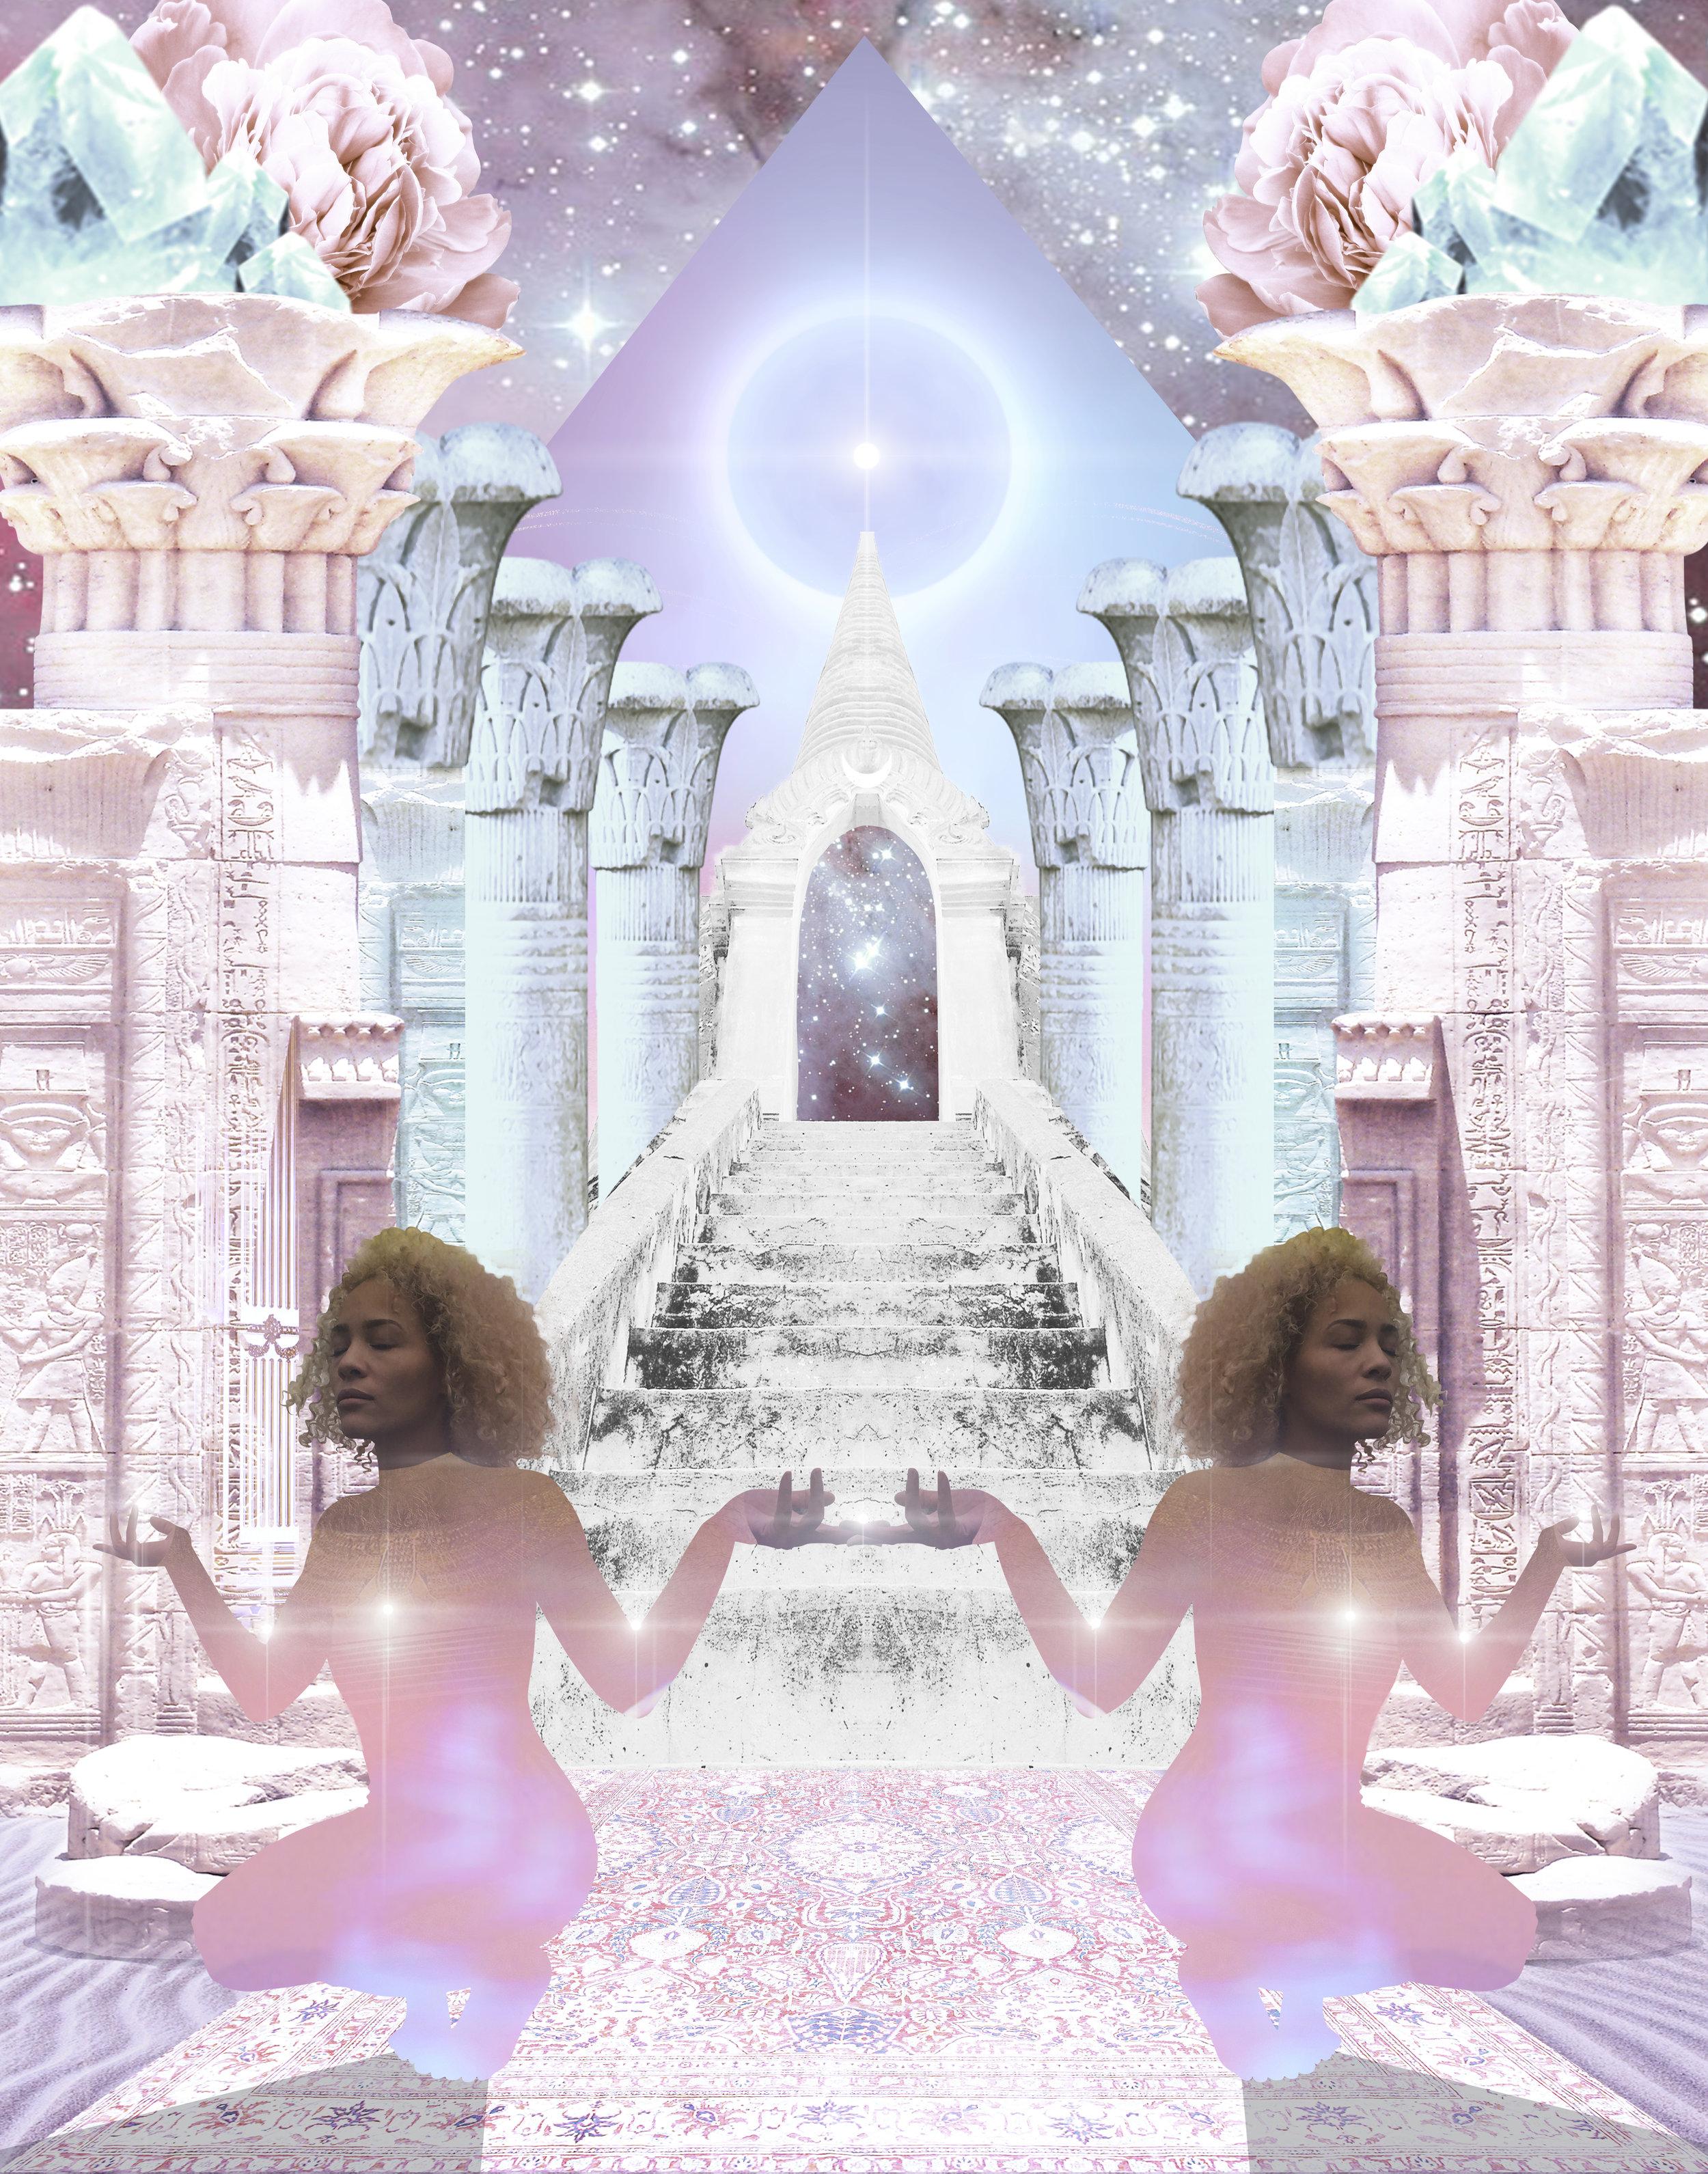 SUIT3-InnerTemple-oct25.jpg